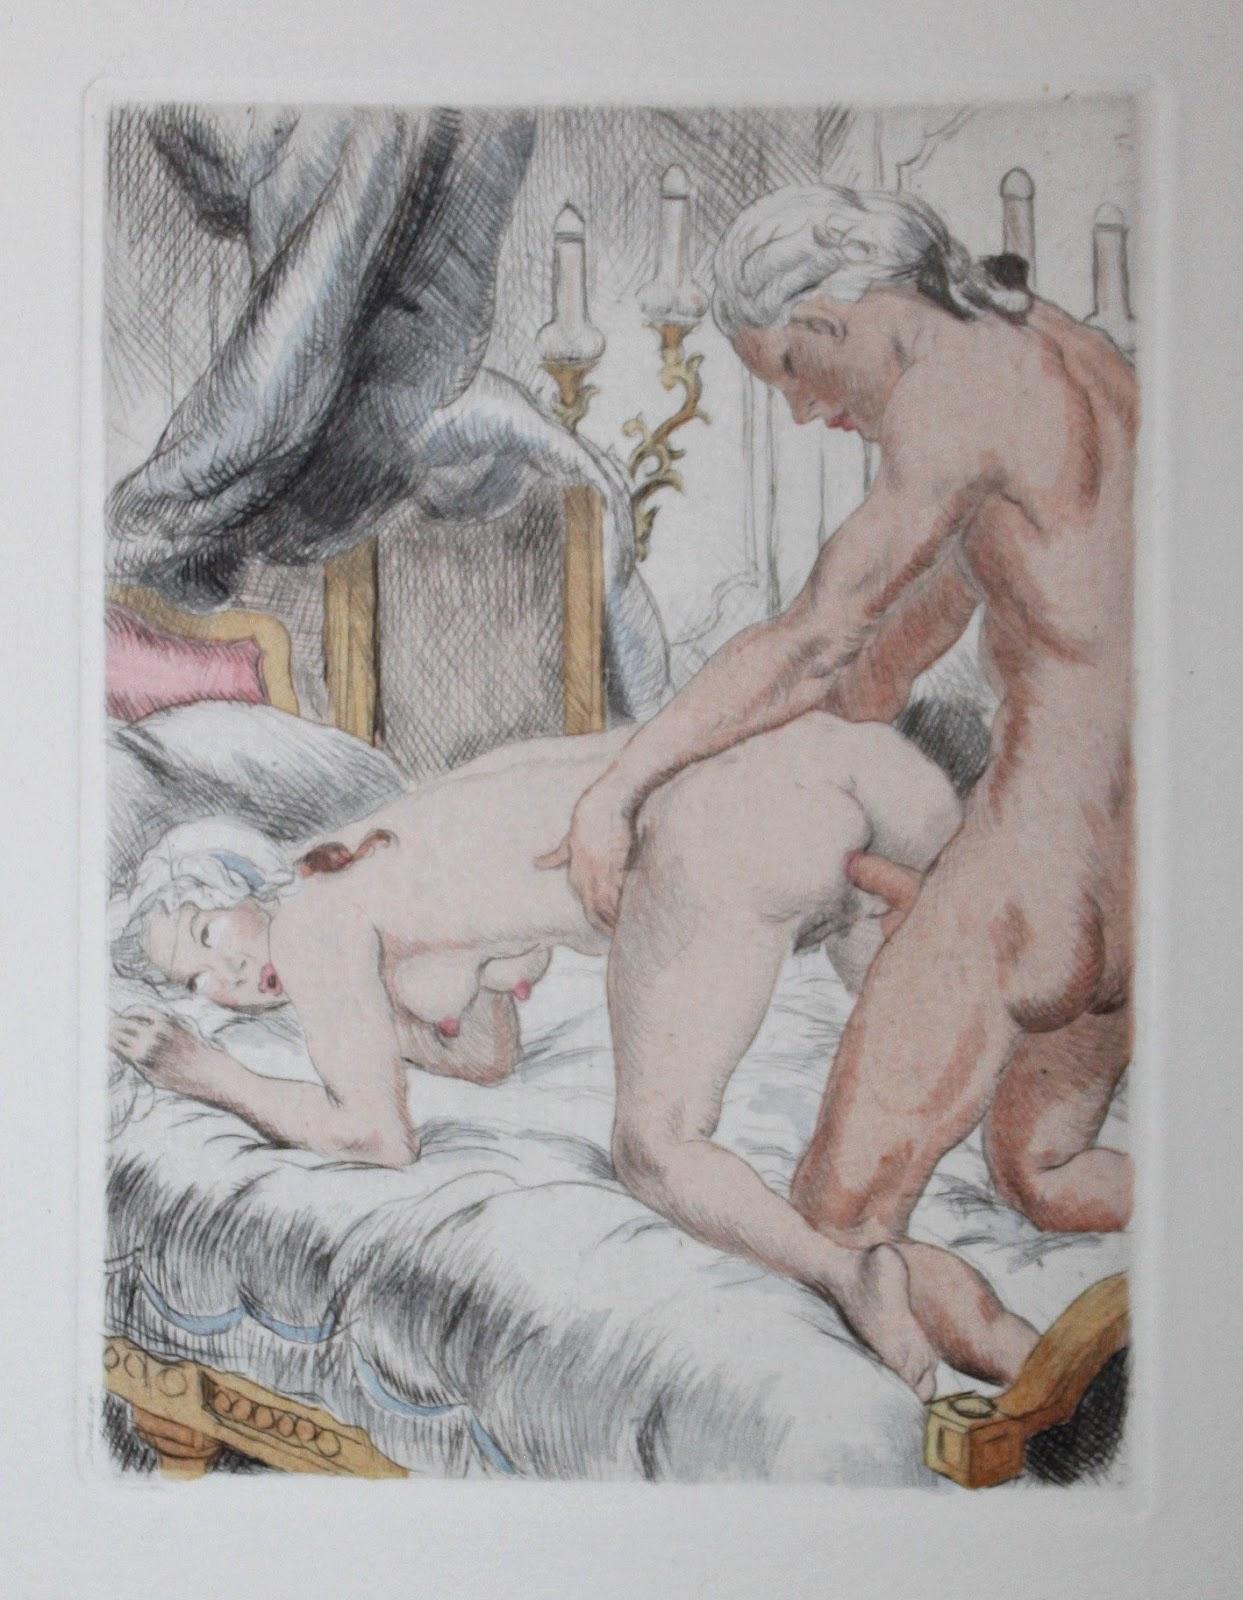 selena gomez nude leaked 2018